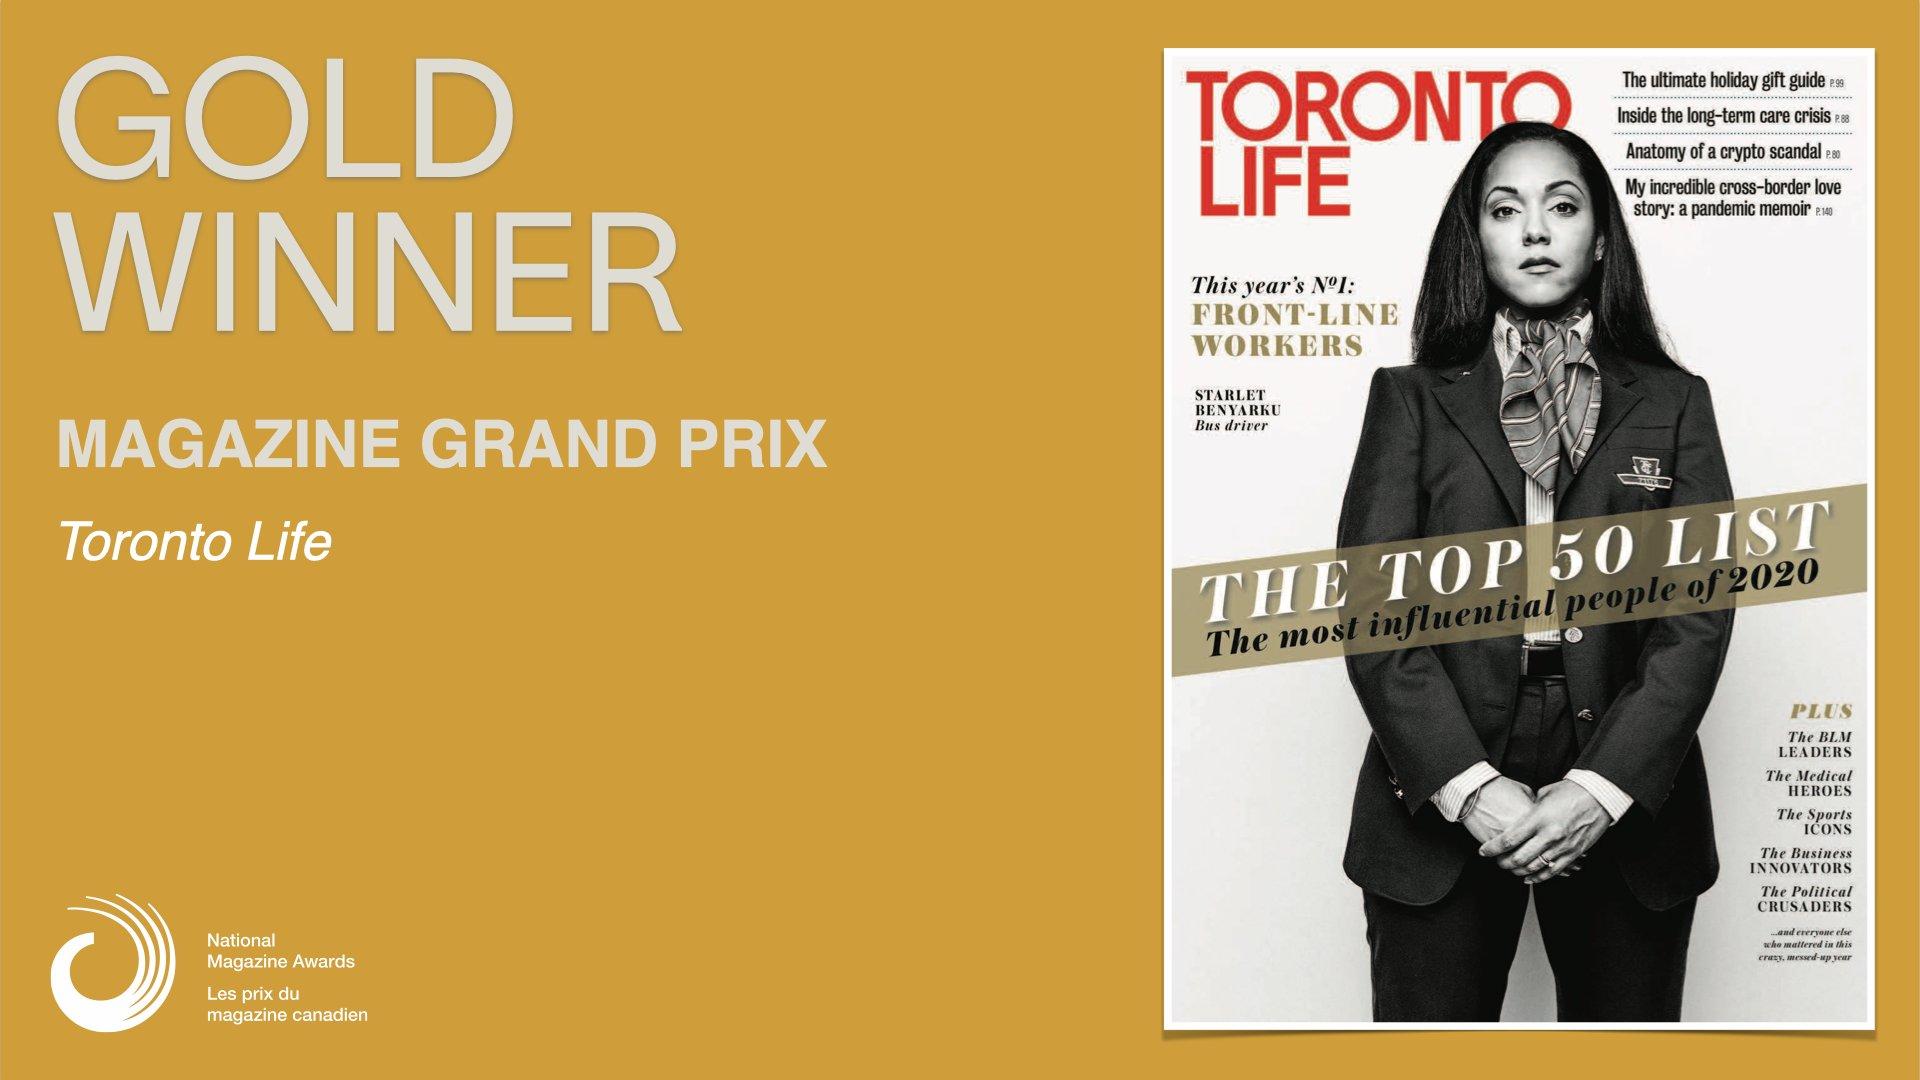 Toronto Life Magazine Grand Prix